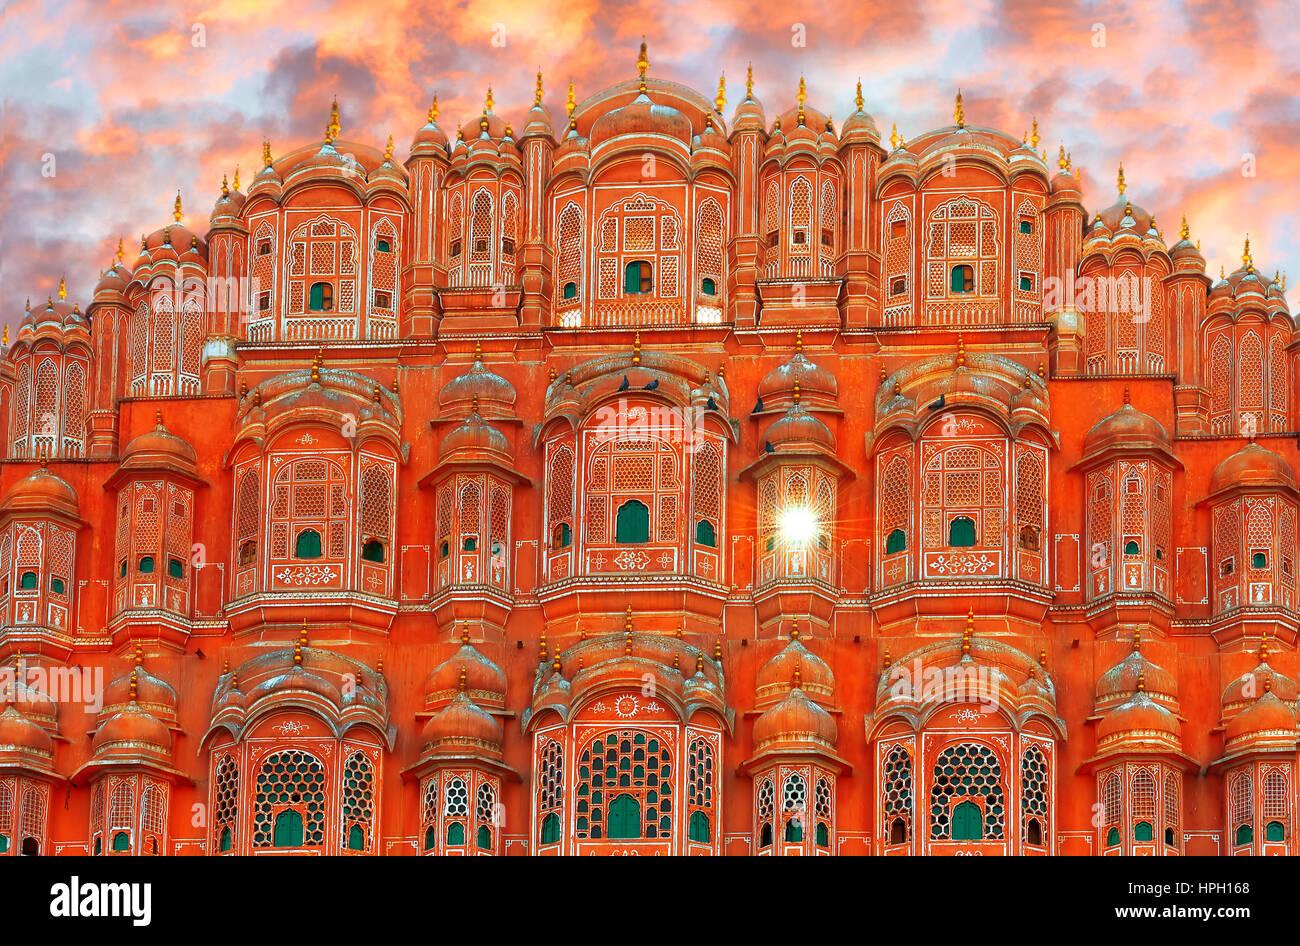 Hawa Mahal - palace complex of the Maharaja of Jaipur, India - Stock Image